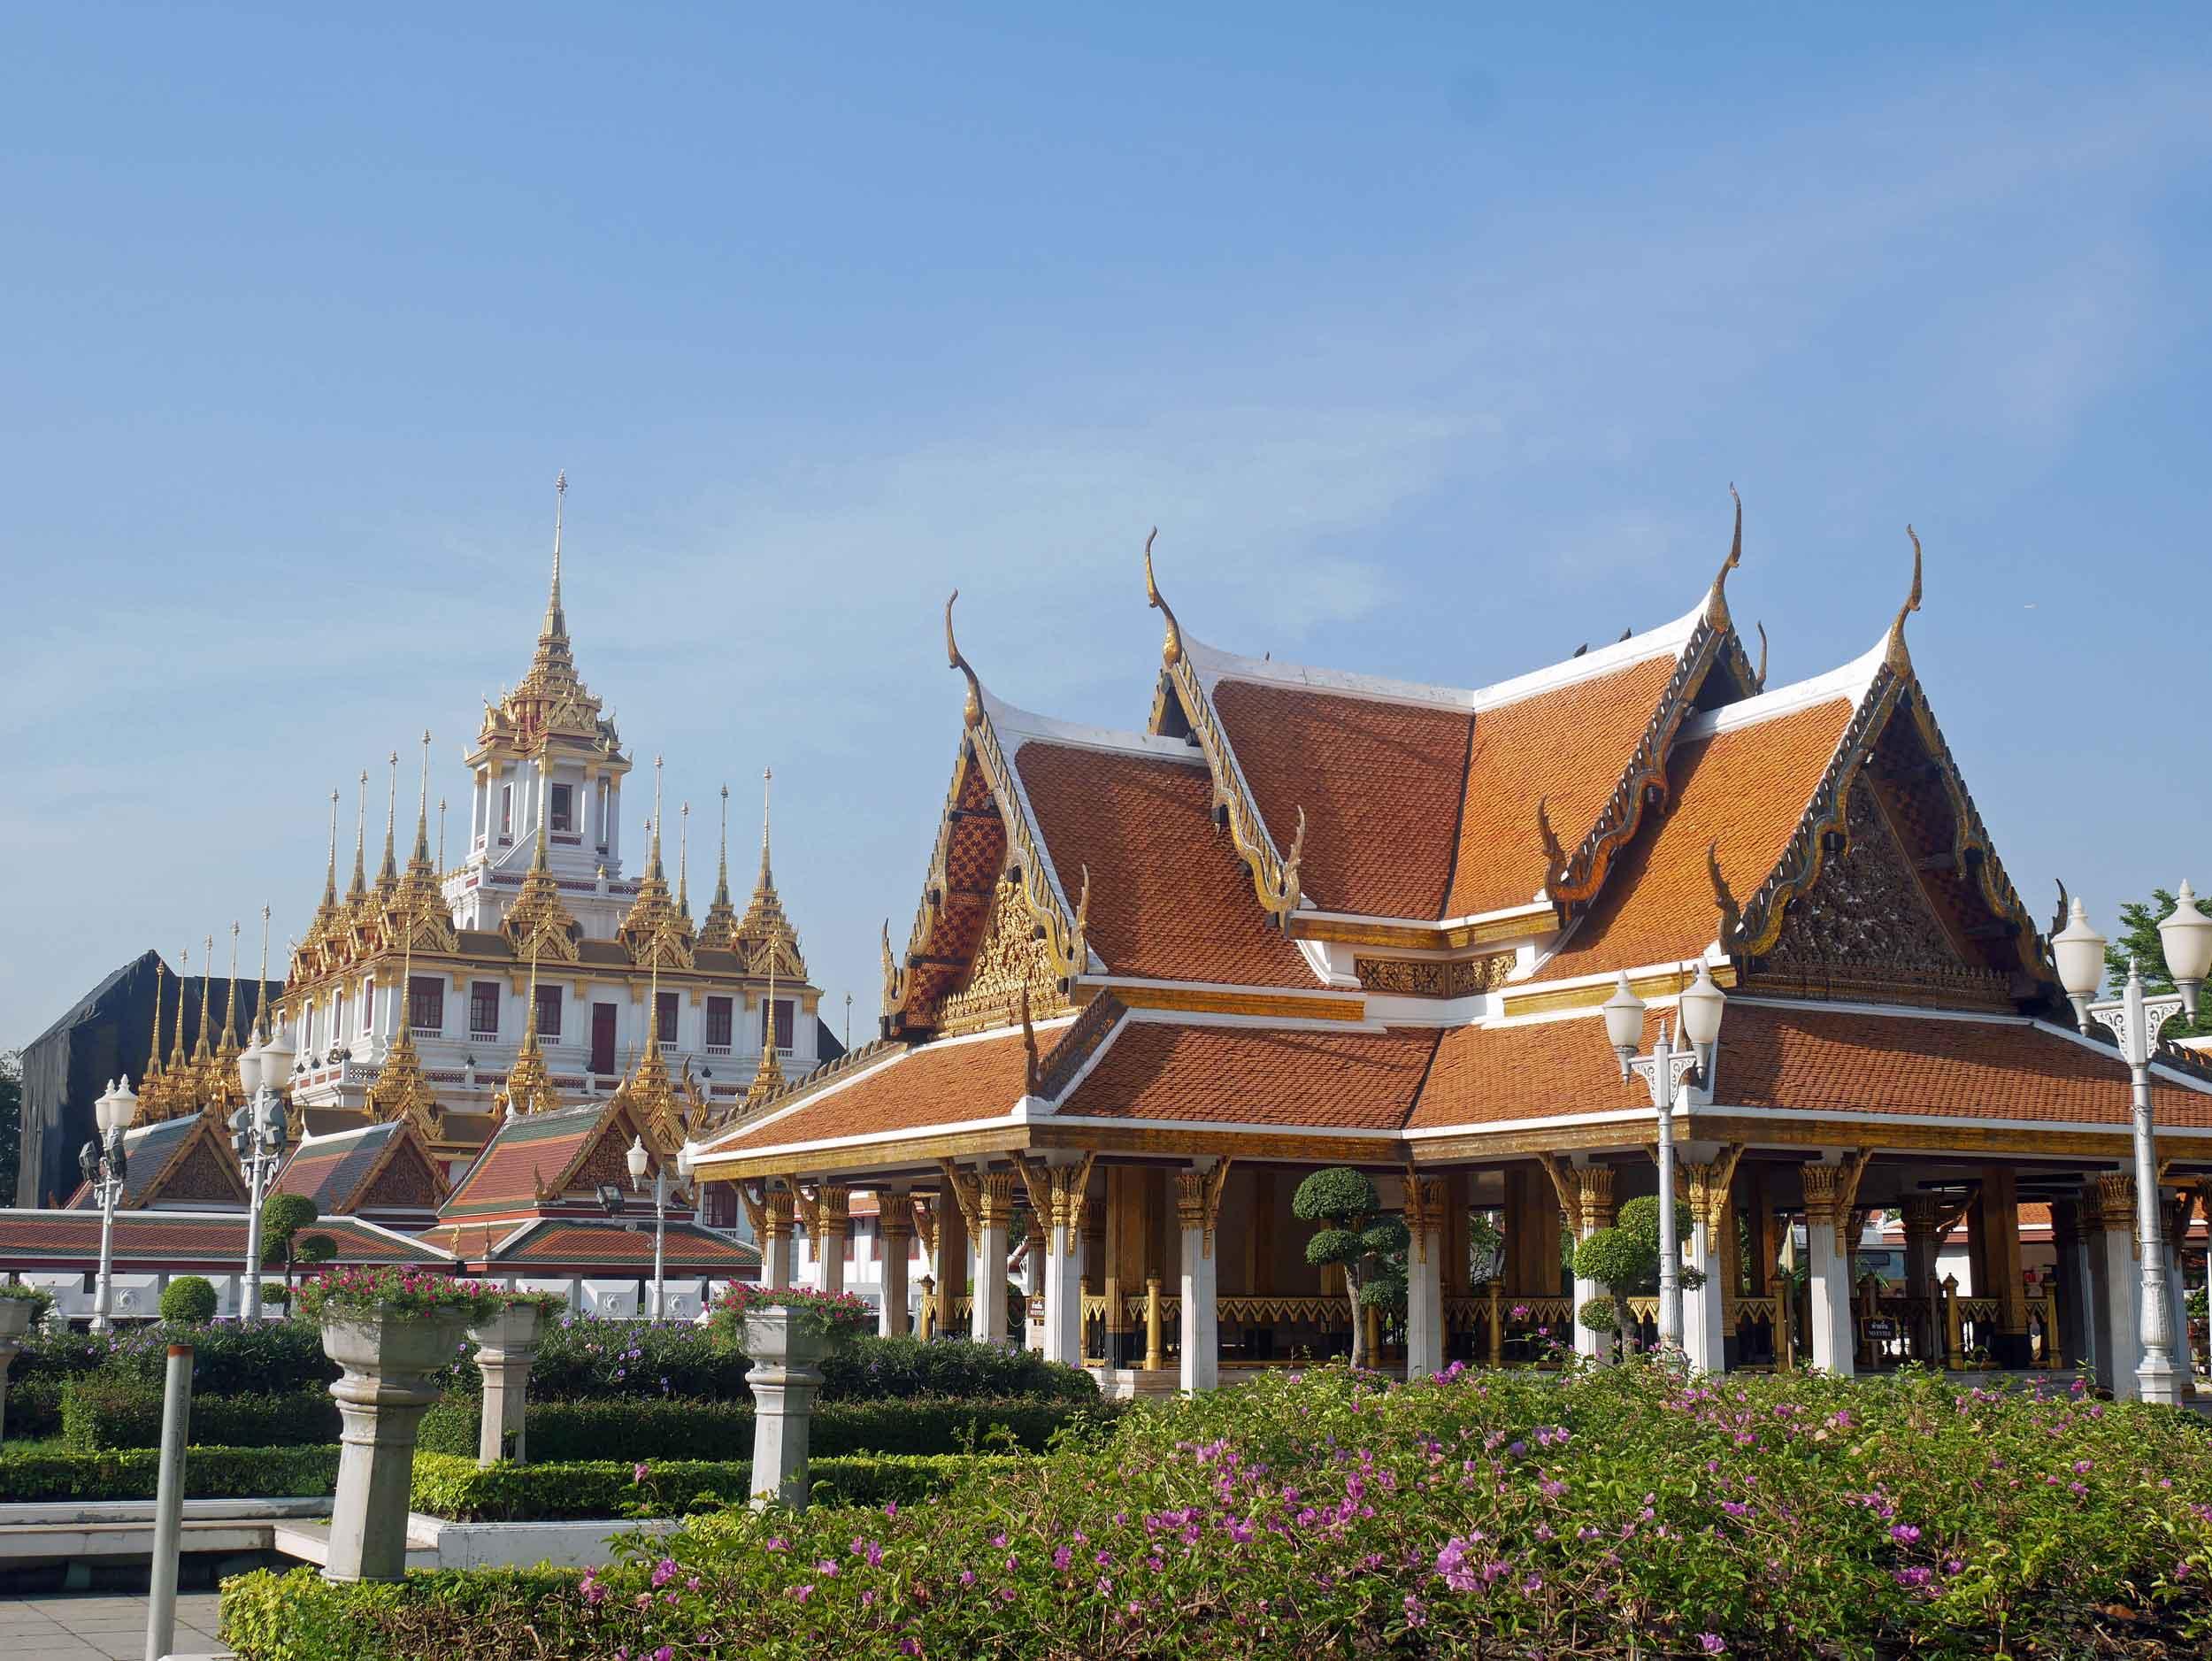 Our first stop was Bangkok's Royal Pavilion Mahajetsadabadin, built in 1989 for the King to receive visitors.